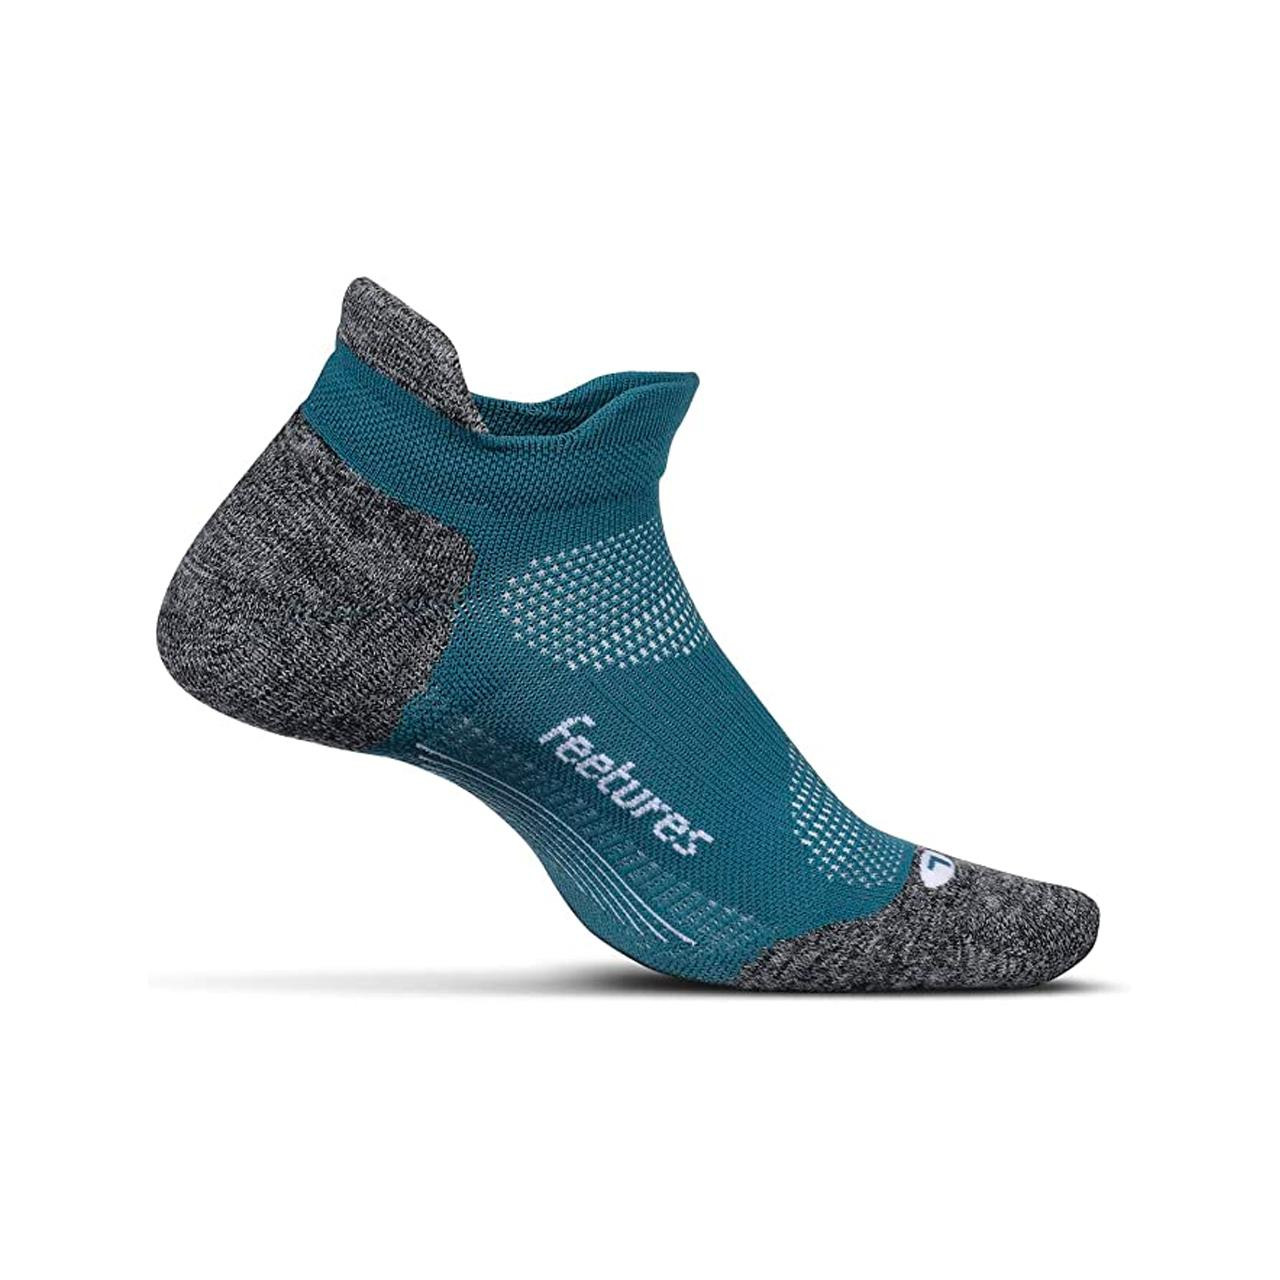 Feetures Elite Light Cushion Running Socks (Emerald, Small)